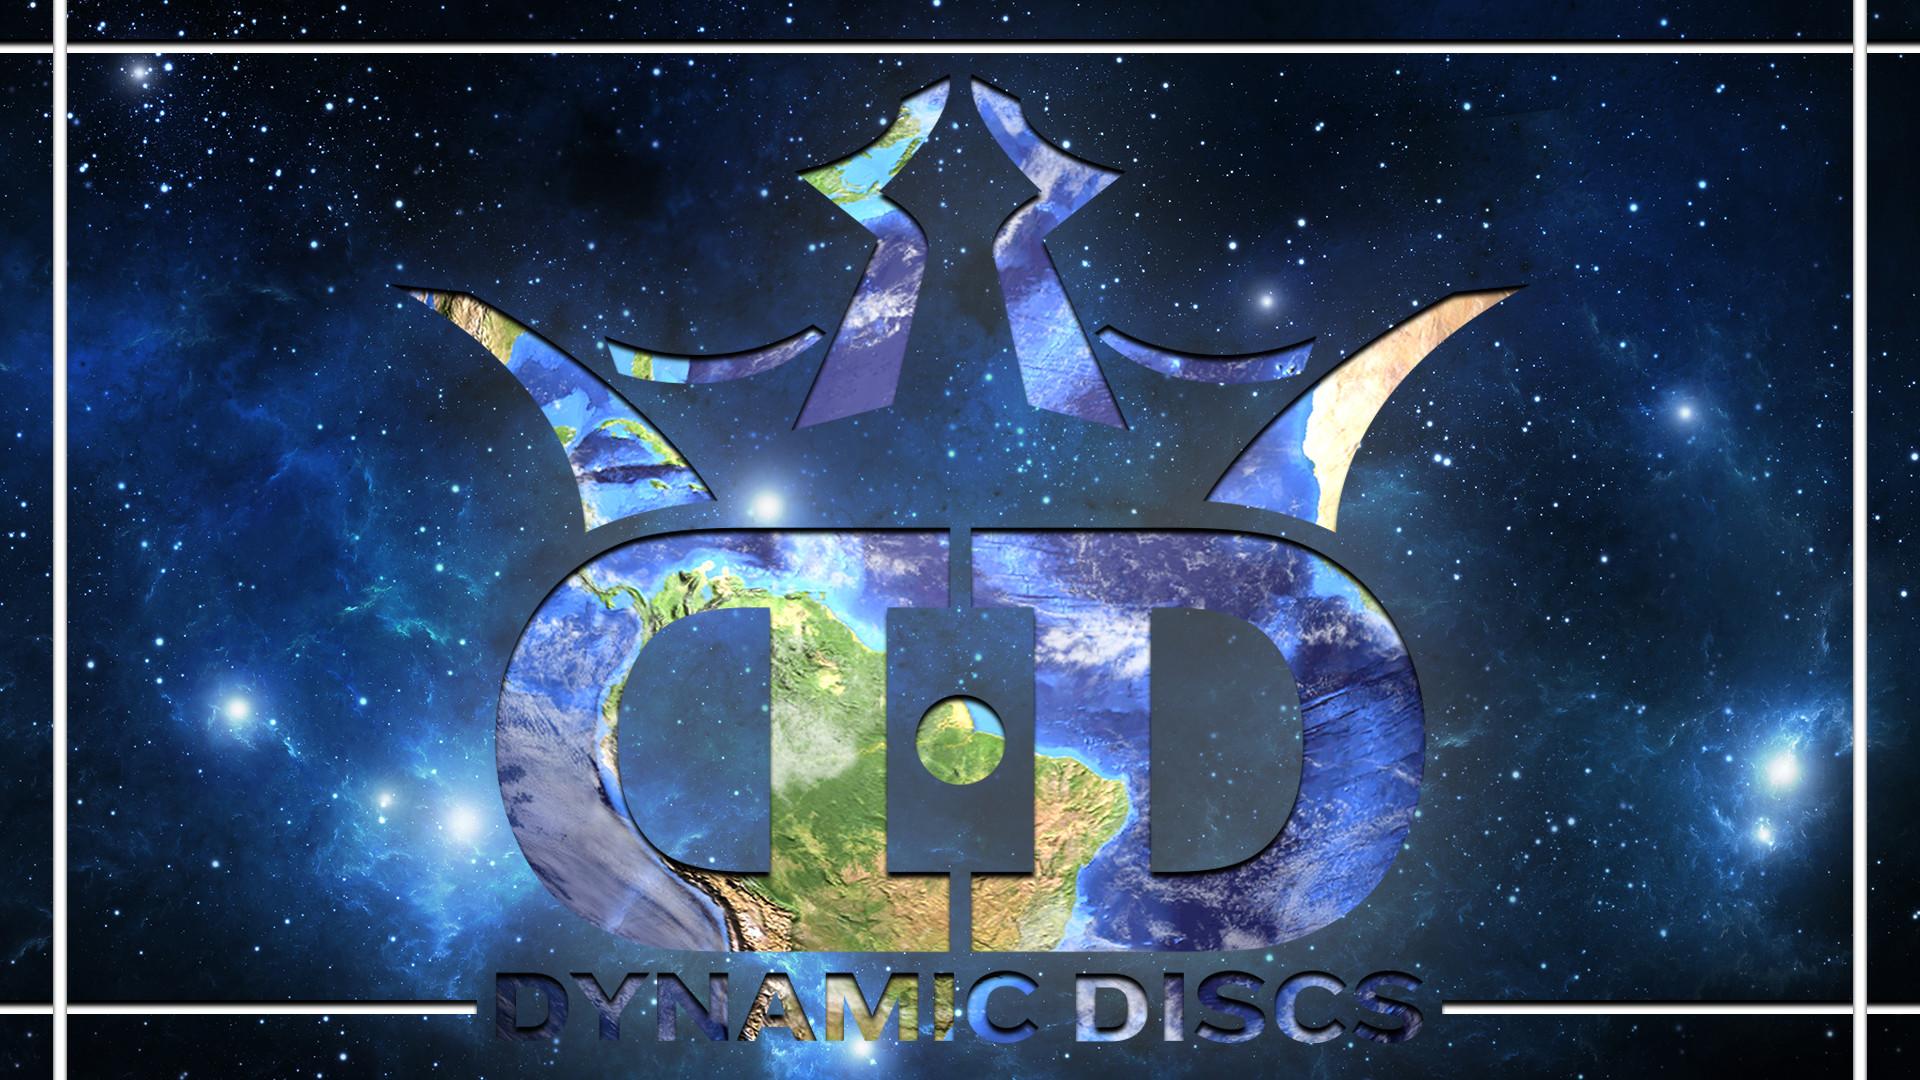 … downloads dynamic discs desktop wallpapers …